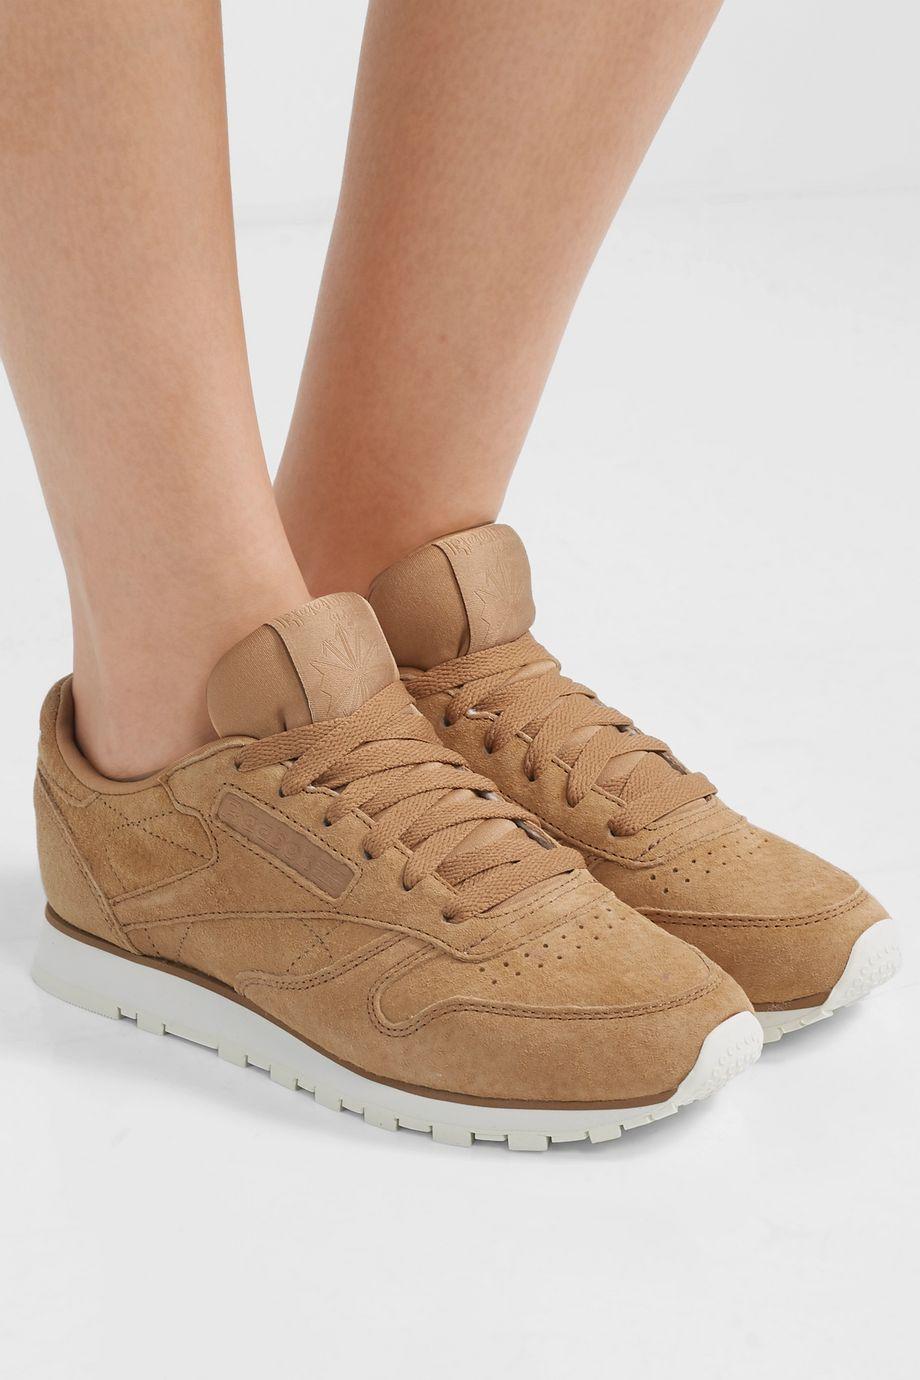 Reebok Classic suede sneakers